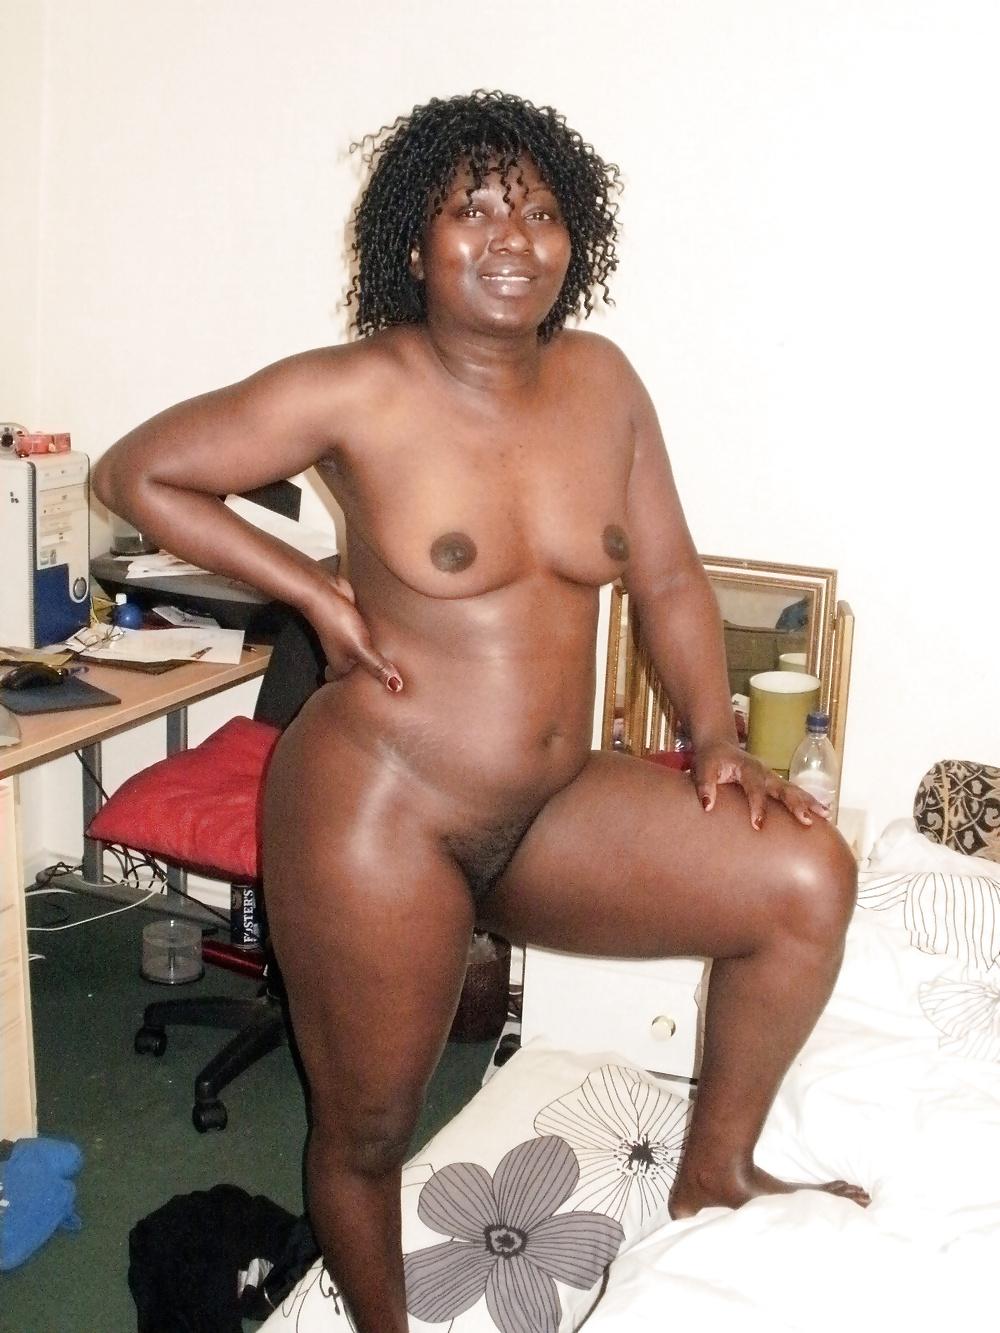 South africa black granny nude selfie